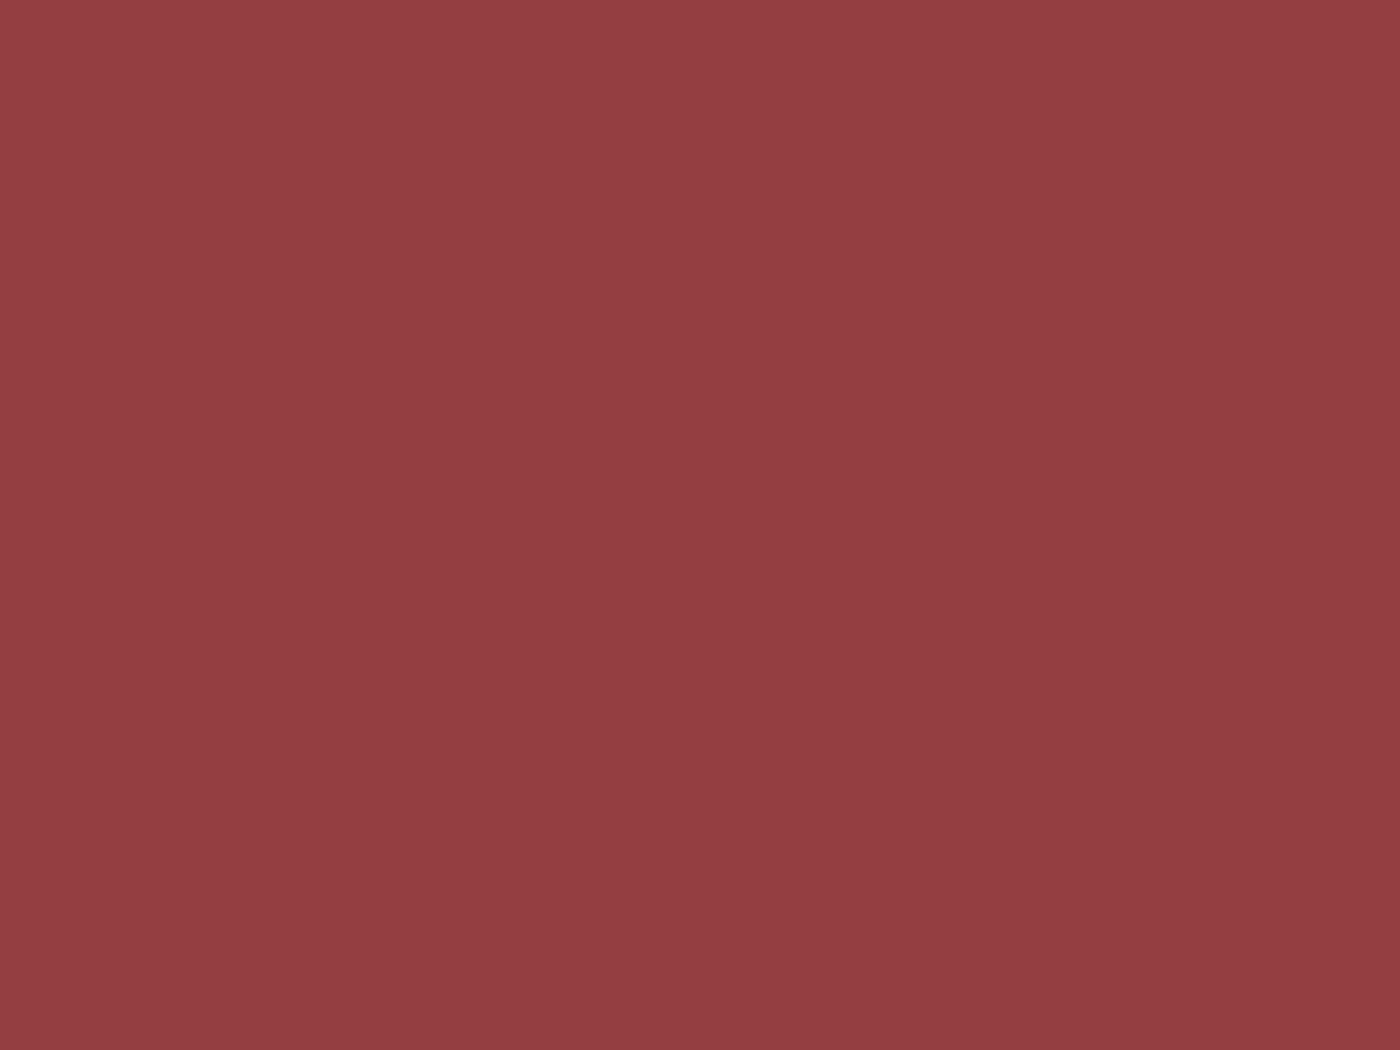 1400x1050 Smokey Topaz Solid Color Background